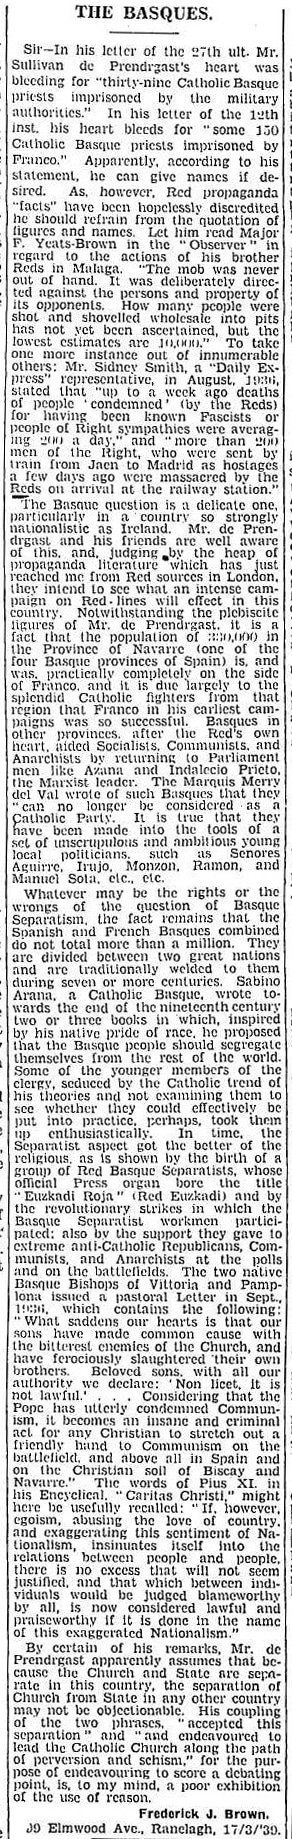 Evening Herald 1939-03-20 p8